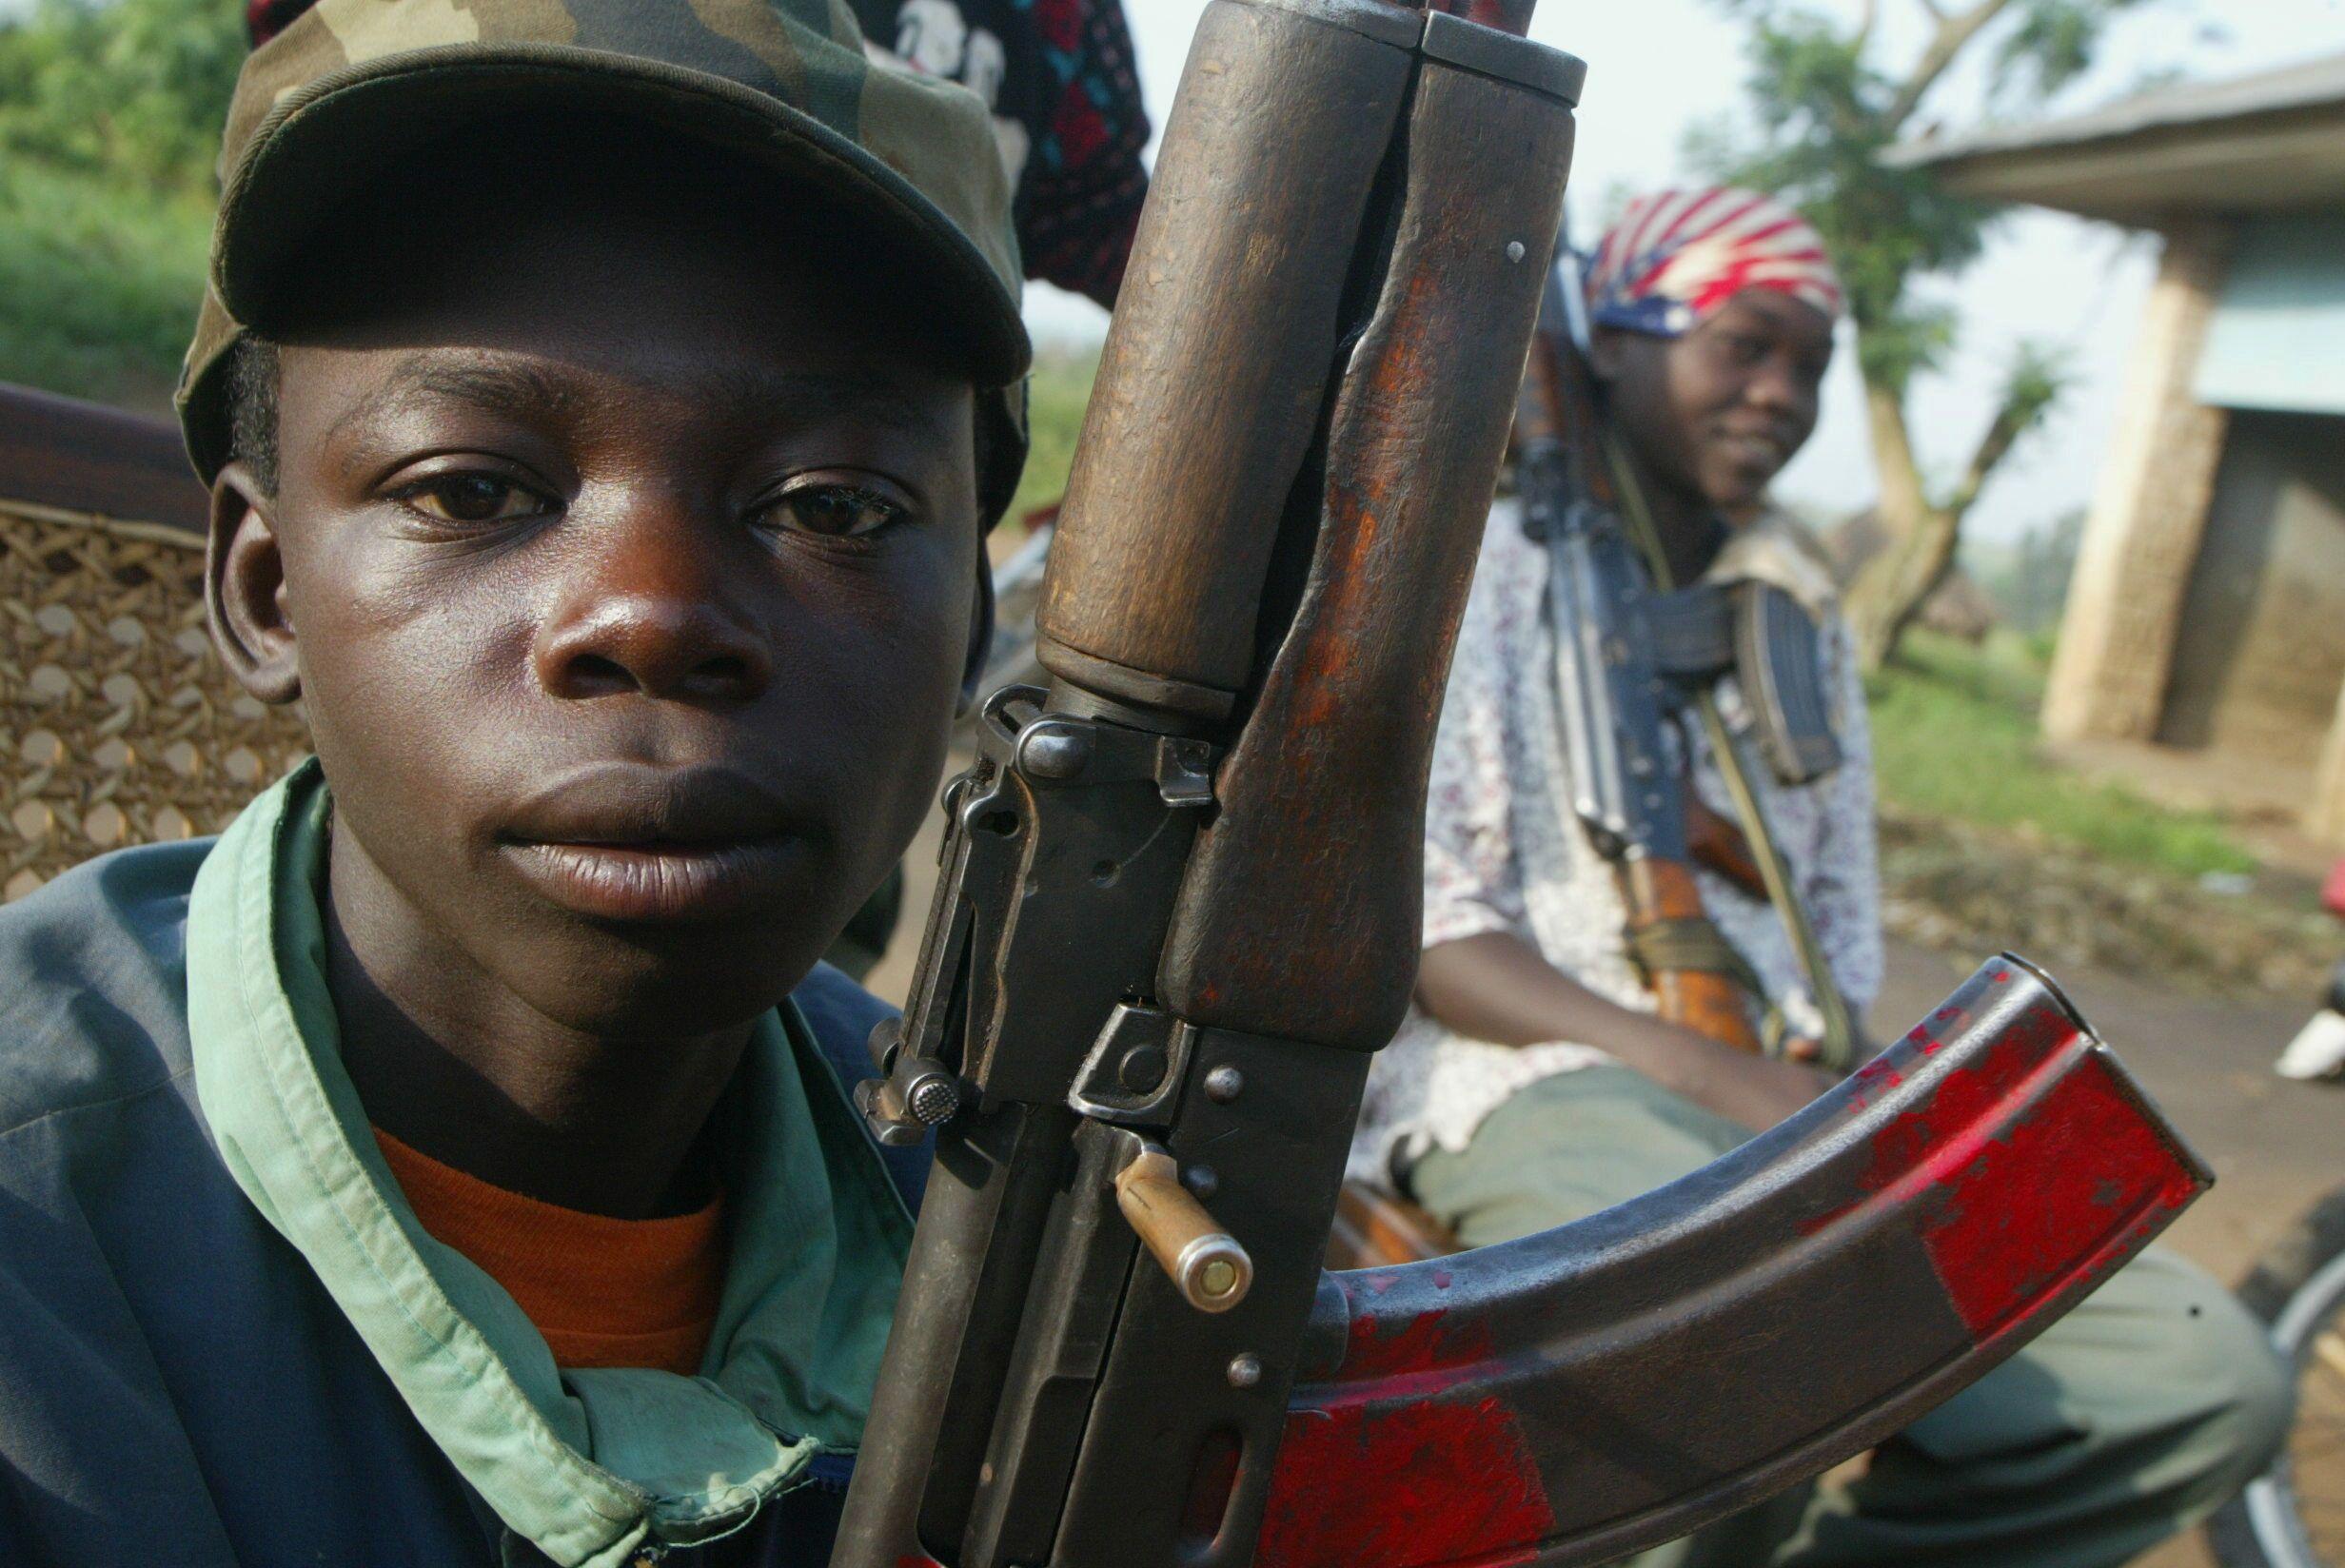 03_31_Child_Soldiers_01